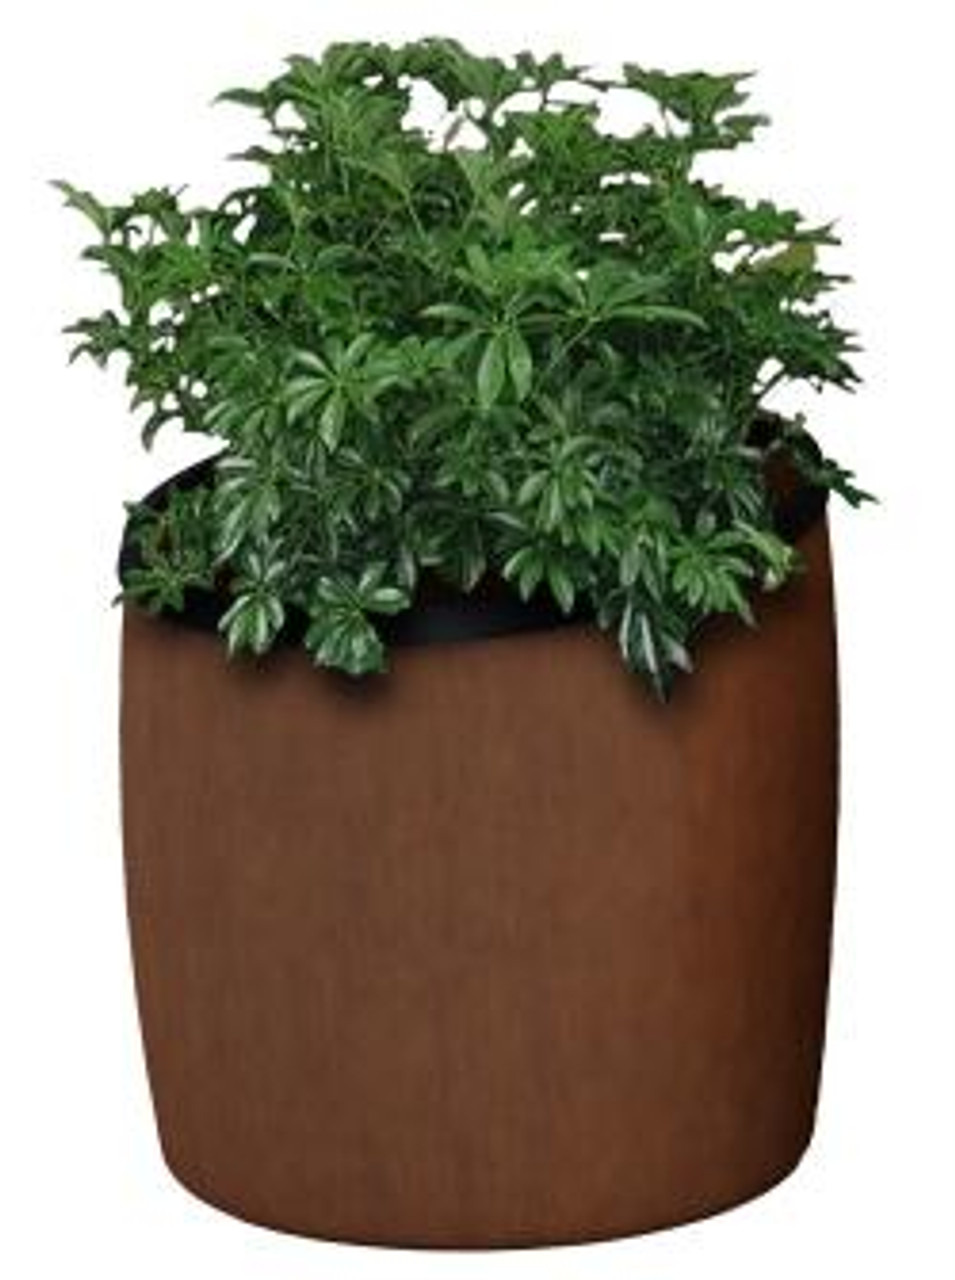 Optional Planter